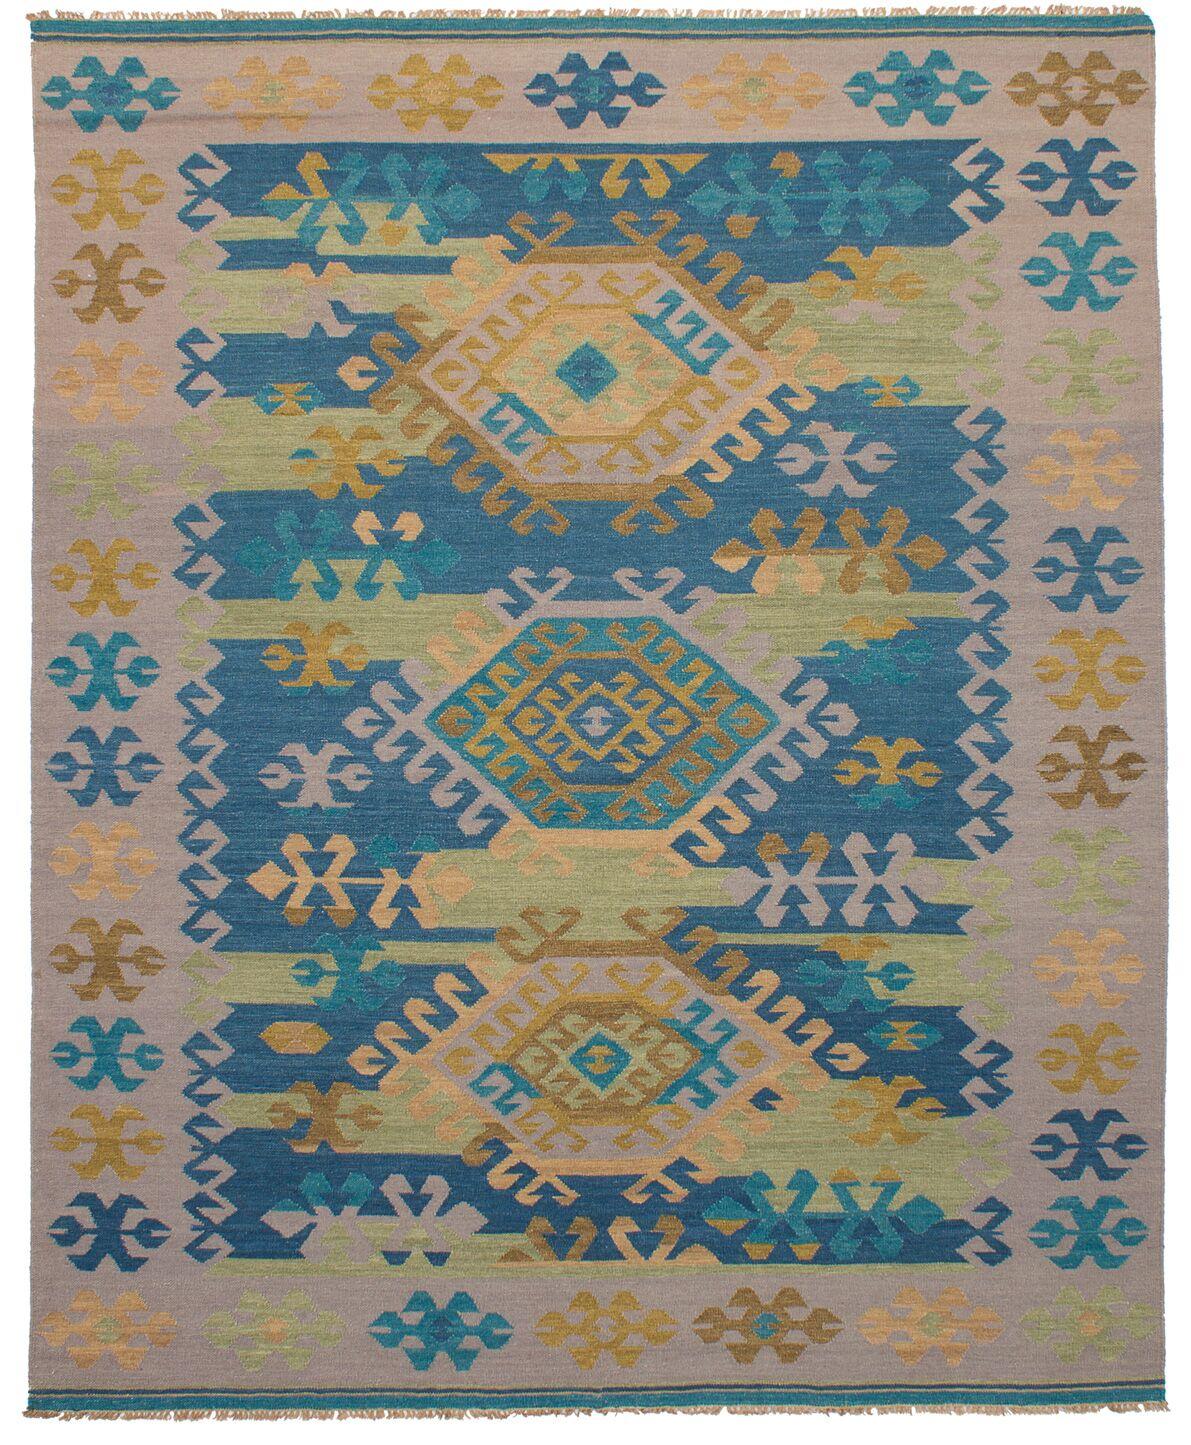 Pavlatka Kilim Hand-Woven Wool Khaki/Turquoise Area Rug Rug Size: Rectangle 8' x 10'